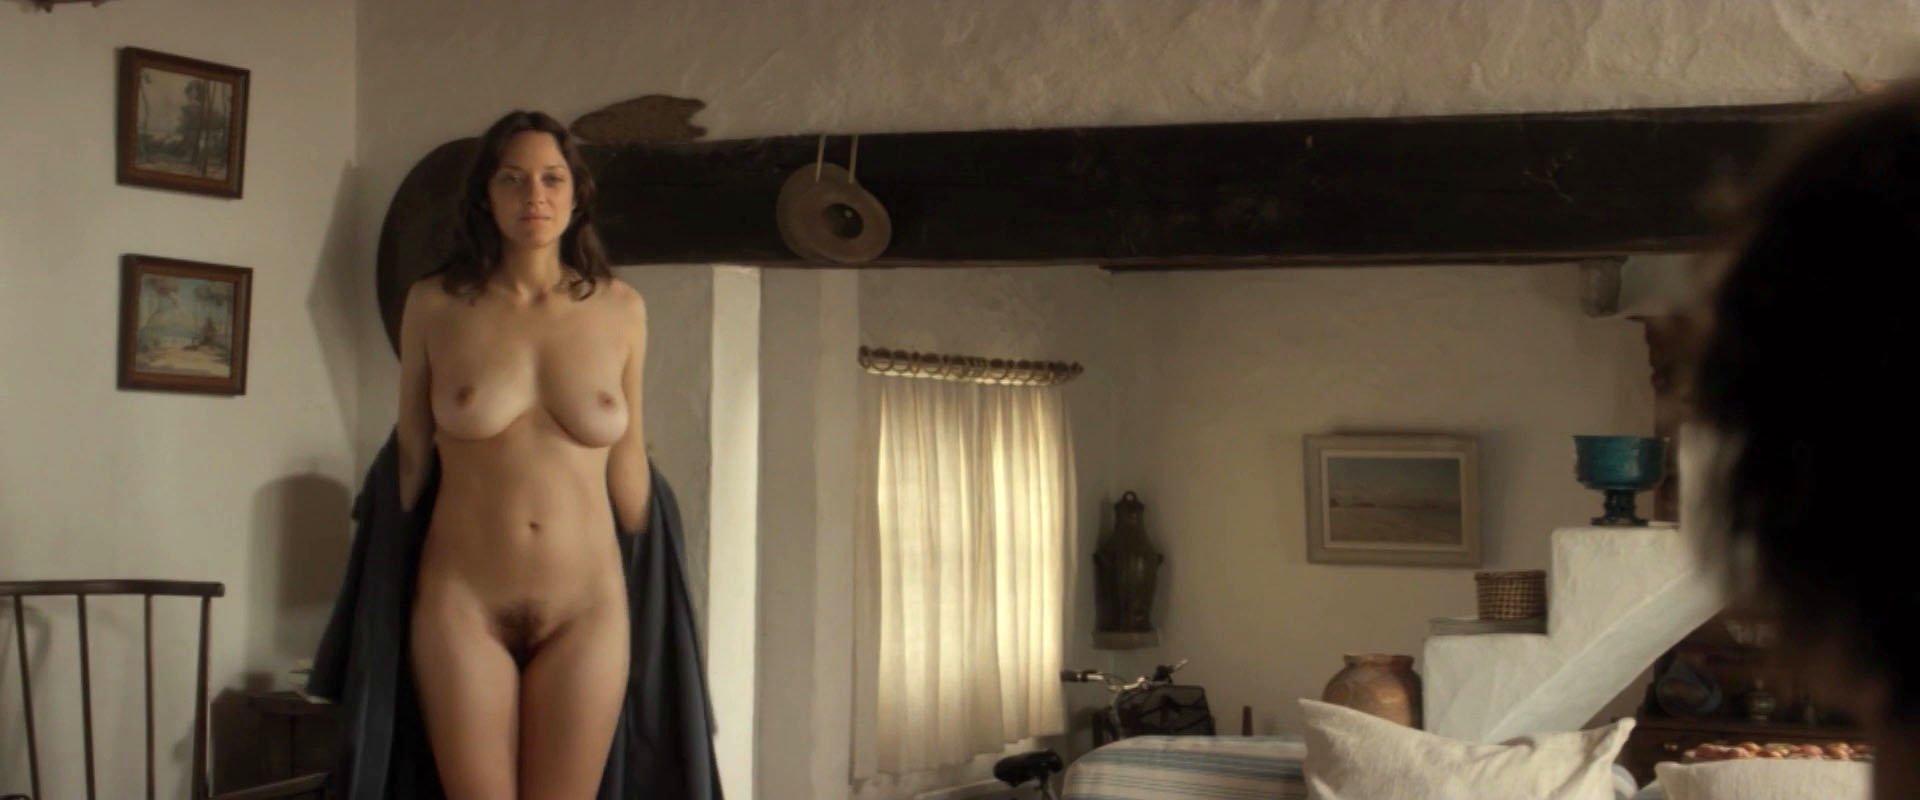 Shanti carson nude sex scene in shortbus scandalplanetcom - 3 part 8